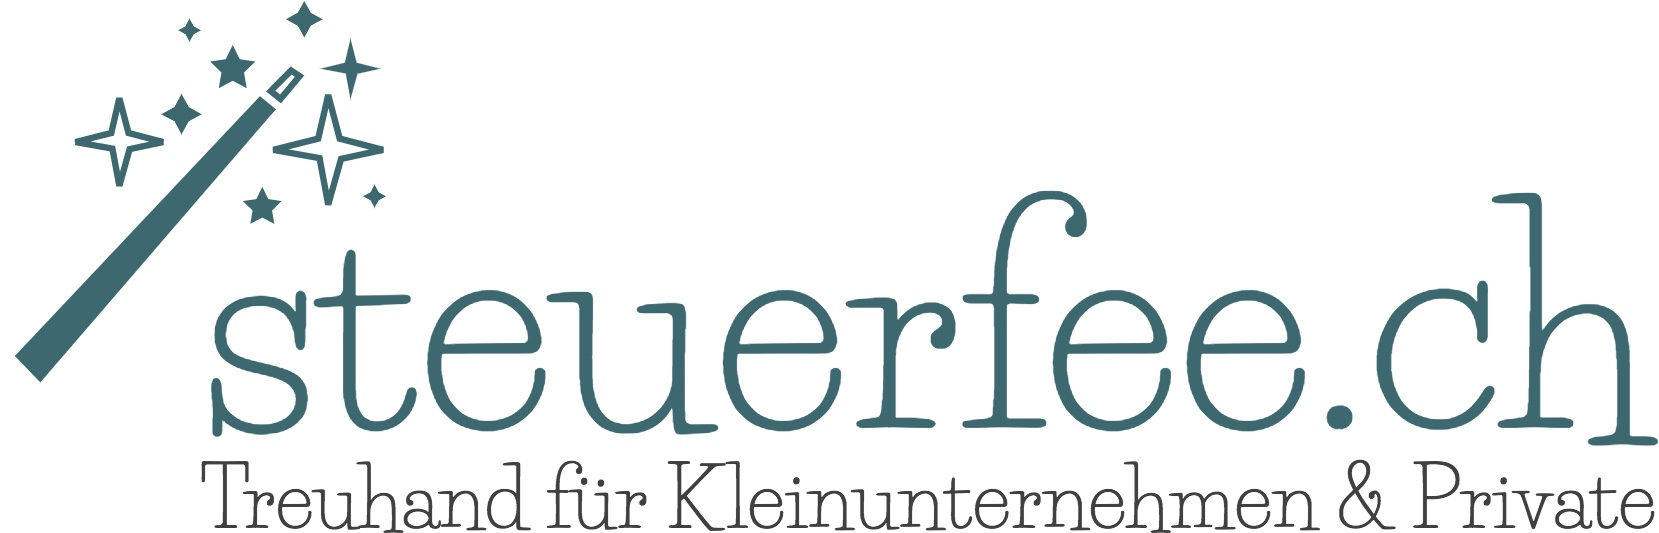 steuerfee.ch-logo grün.jpg